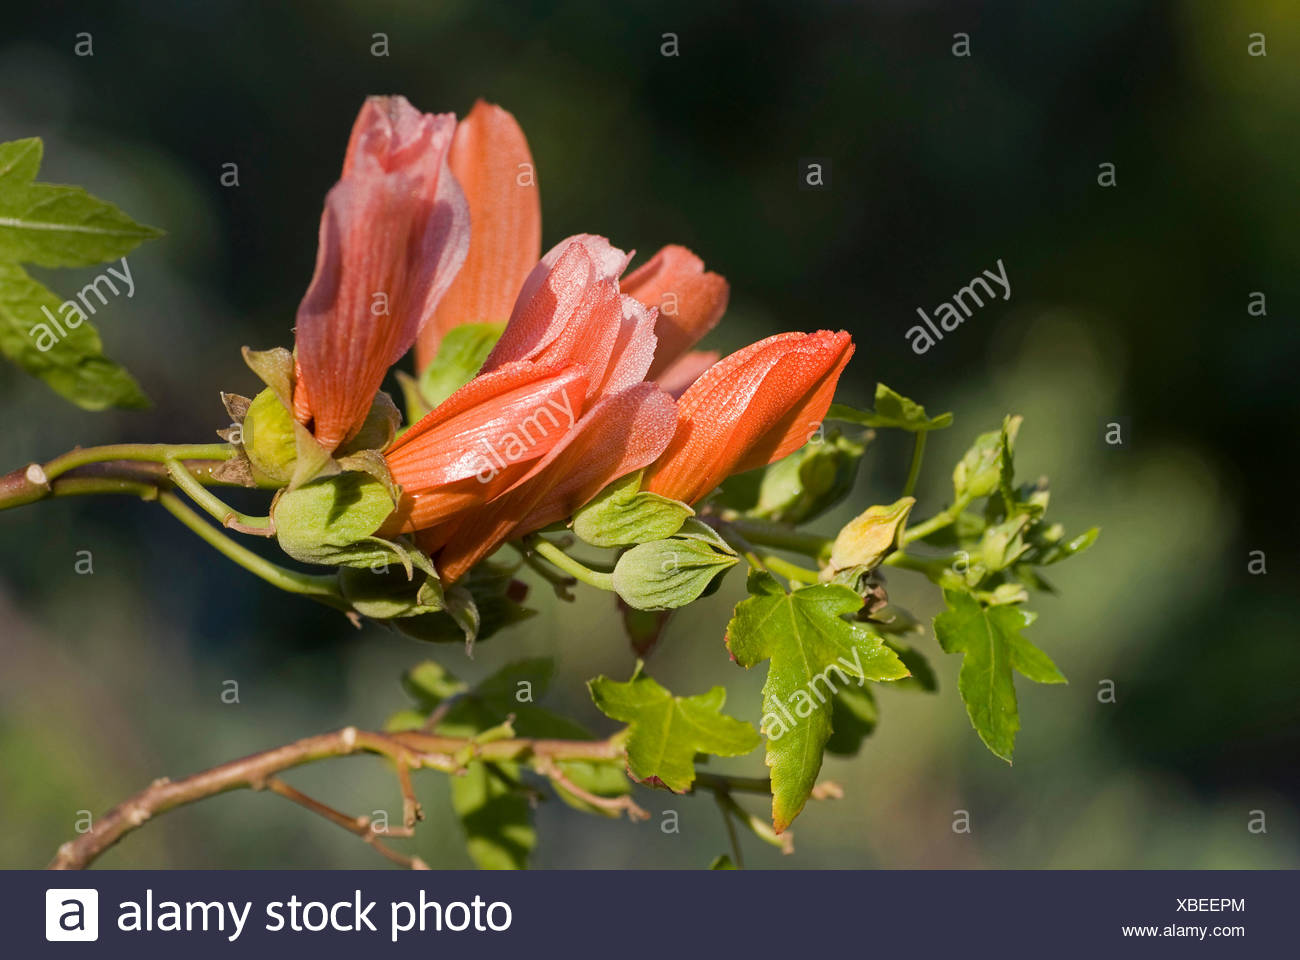 Lachs-rot Kanarischen Strauch Malve (Lavatera Phoenicea), blühen, Kanarische Inseln, Teneriffa Stockbild